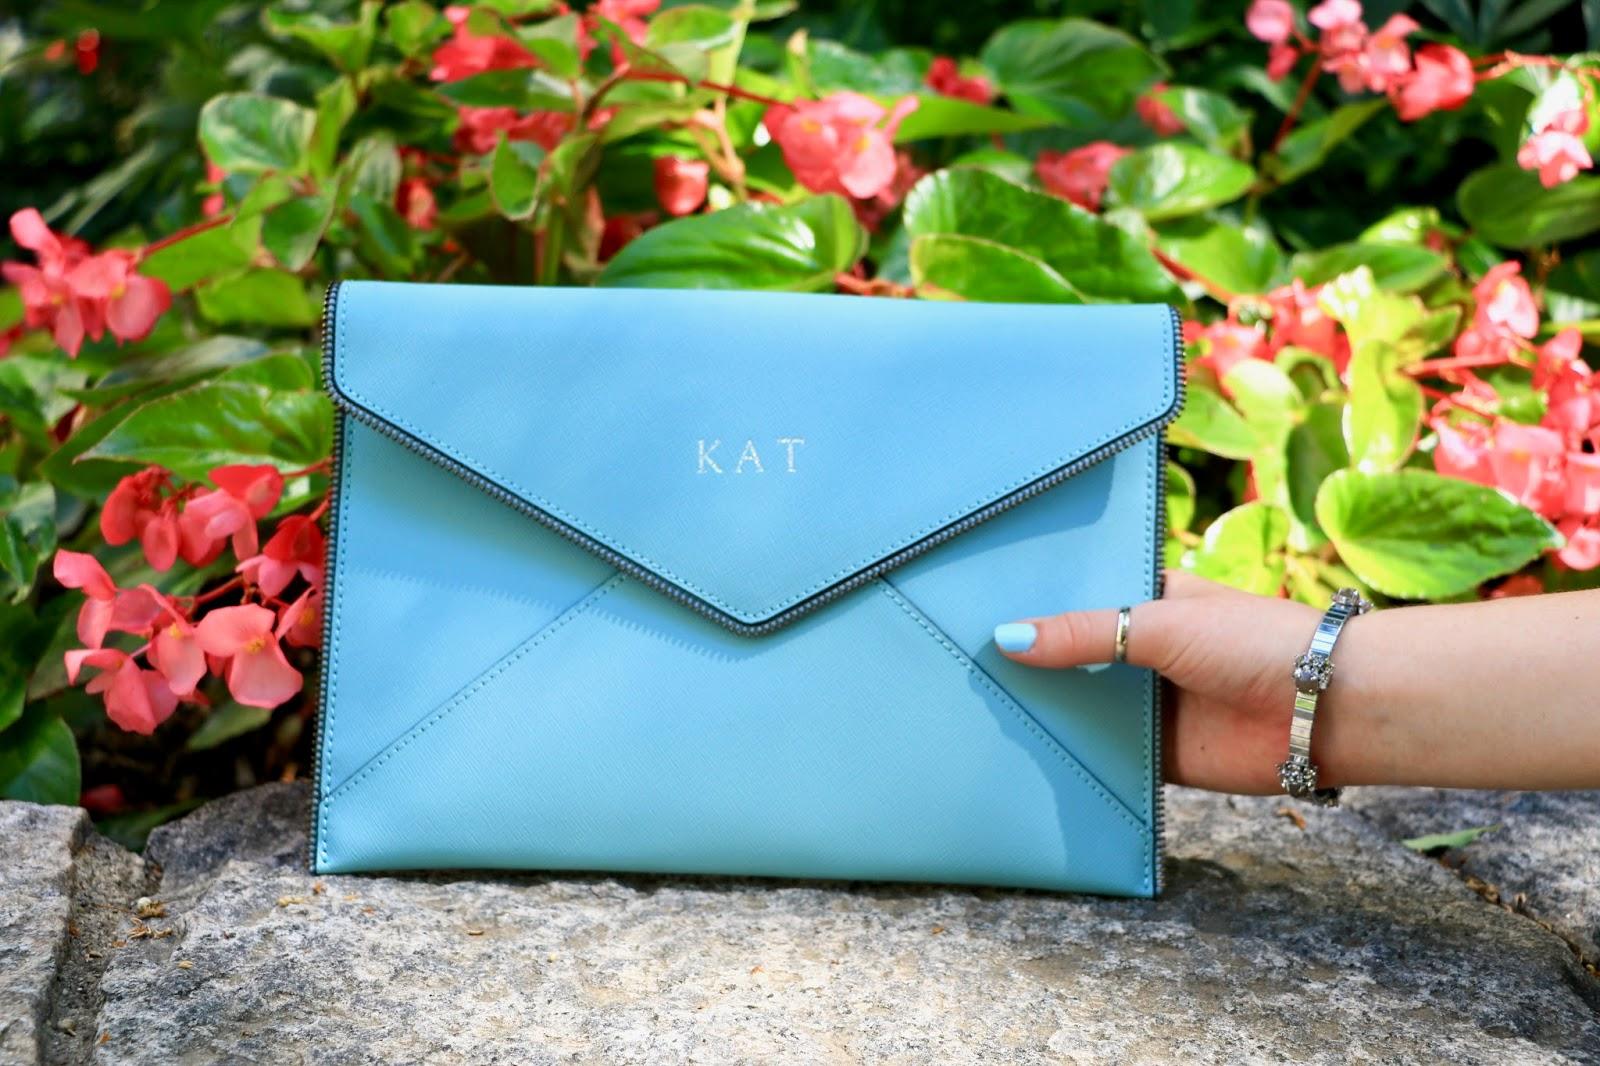 rebecca minkoff light blue envelope clutch